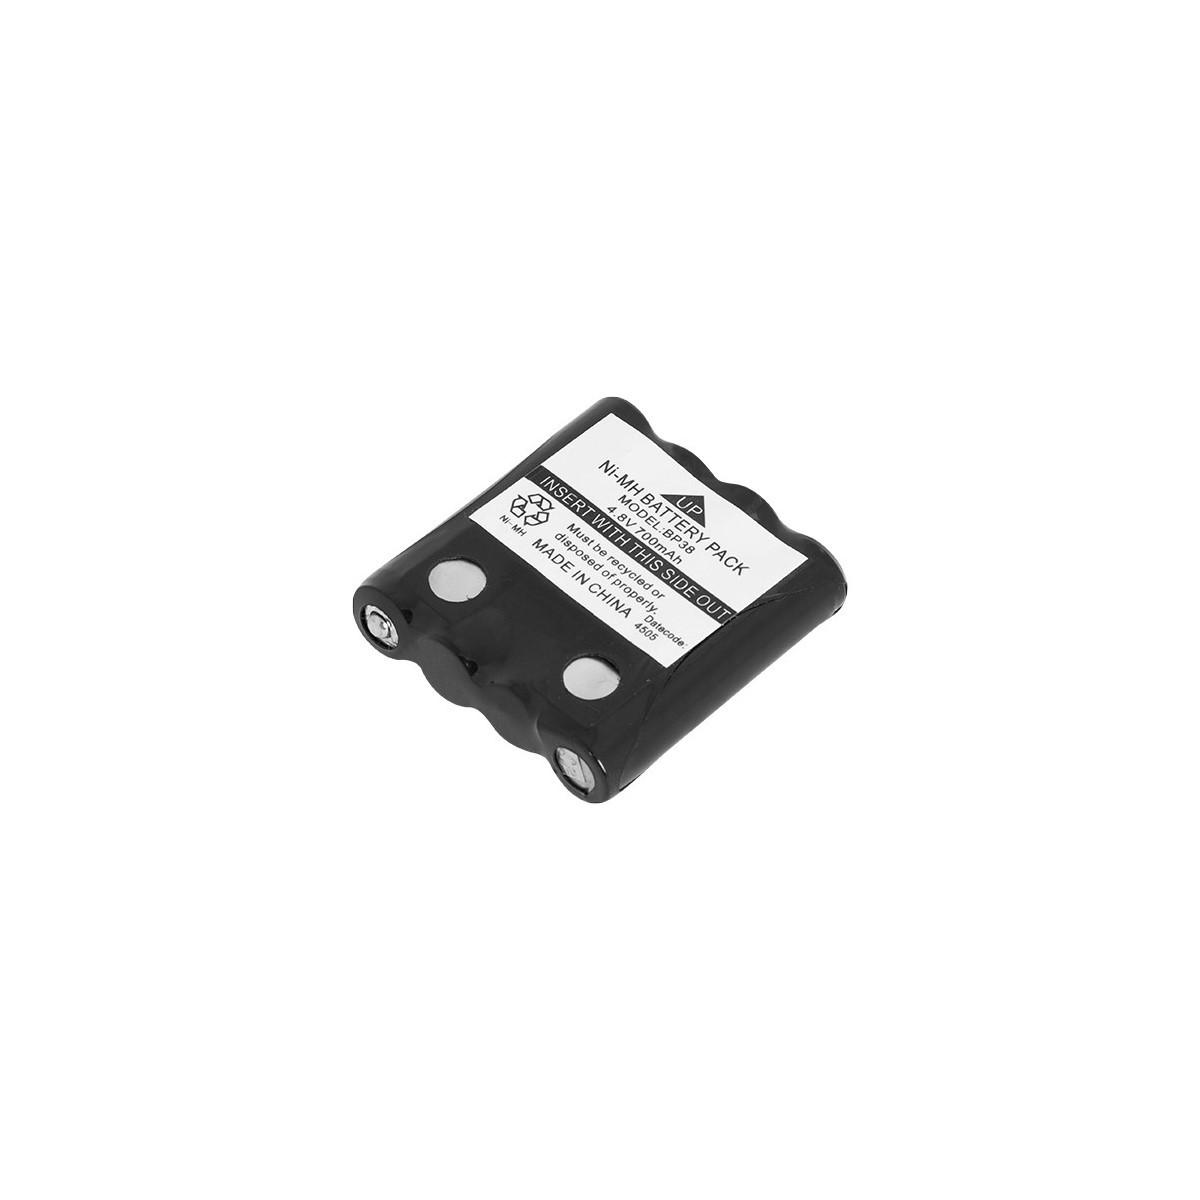 Bateria p/ Radio Motorola / Intelbras Talkabout BP38 4,8V 700mAh 4RT700AAATA-LG Rontek